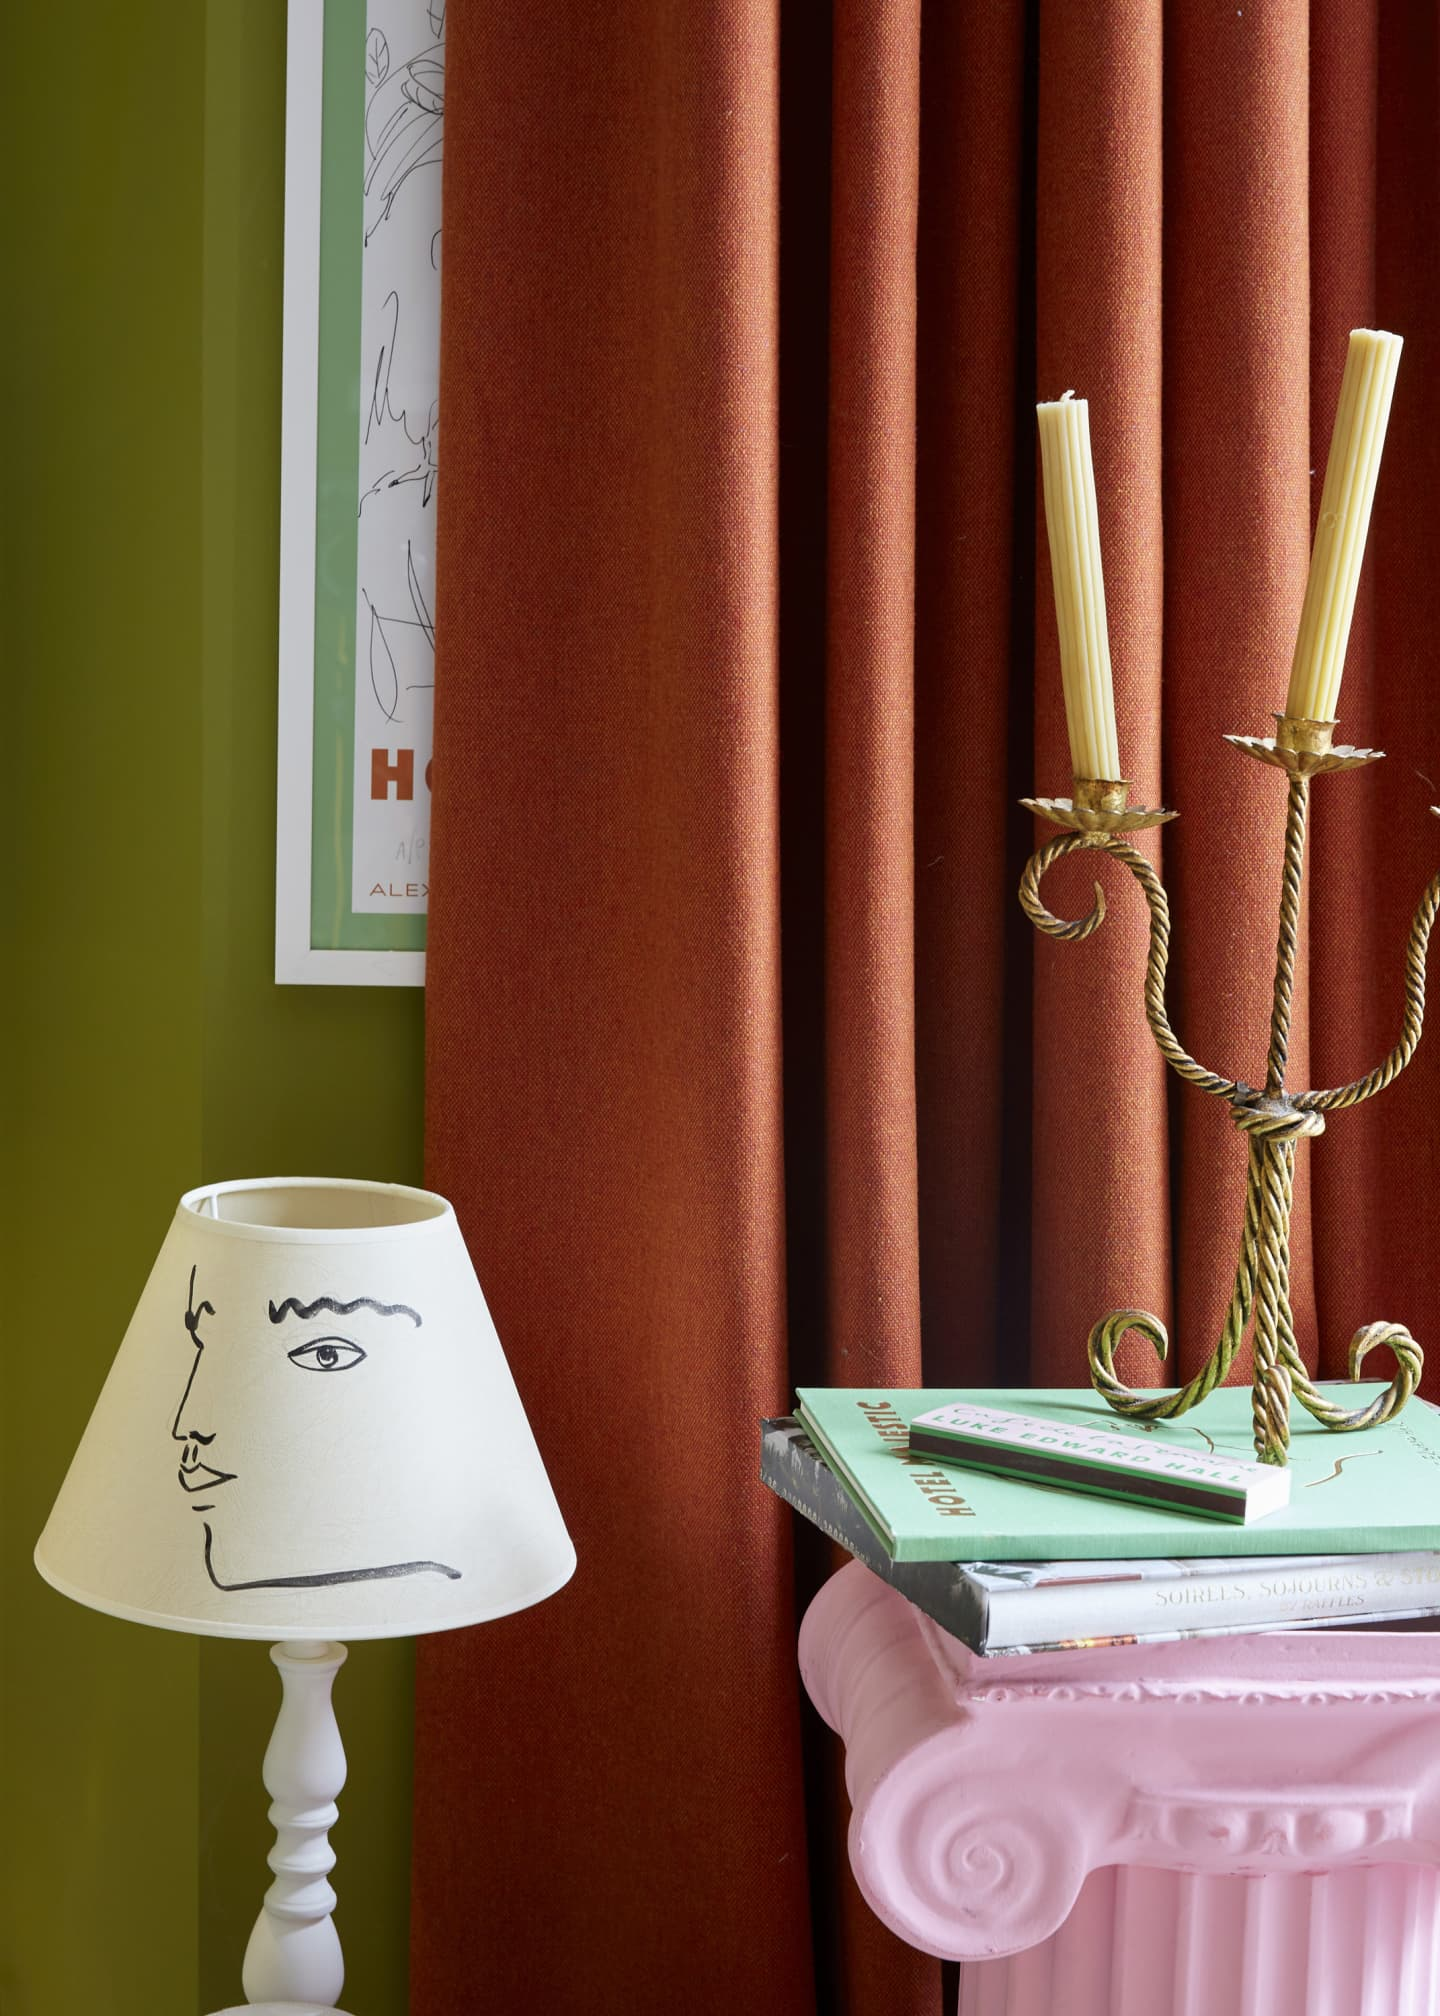 orange curtain behind pink pillar and lamp